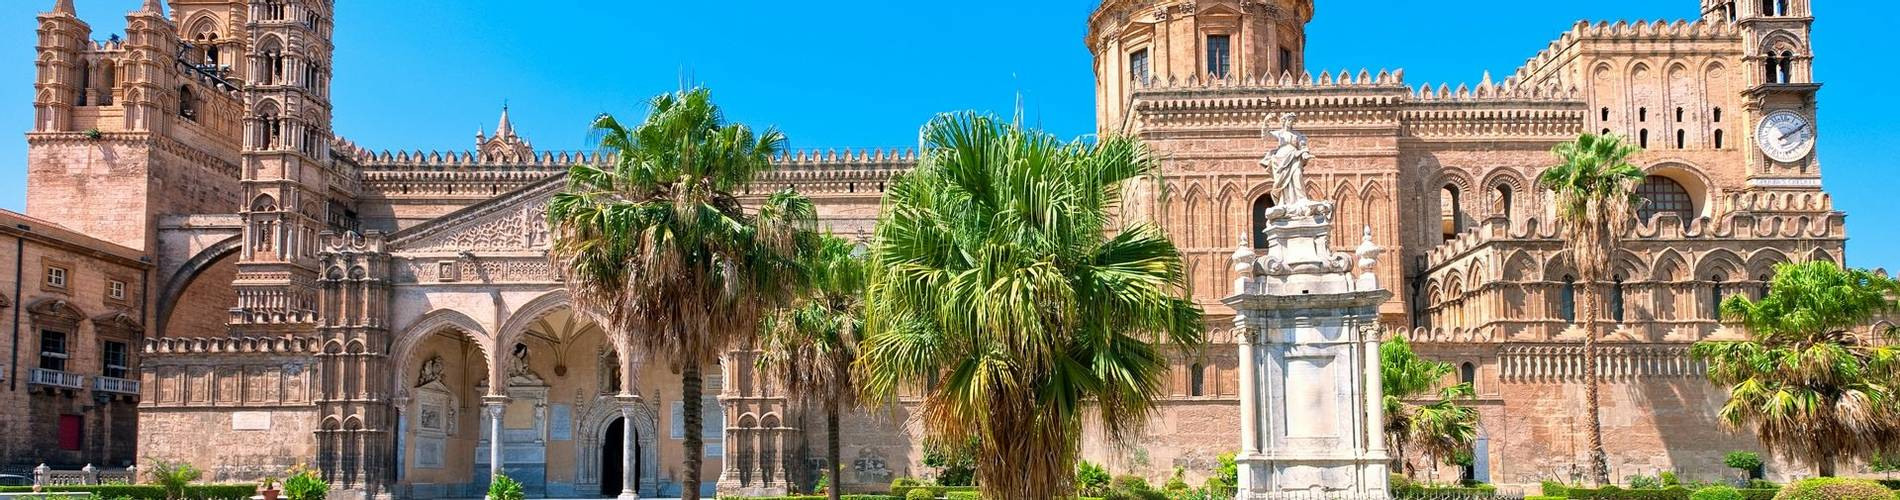 Palermo, Sicily.jpg